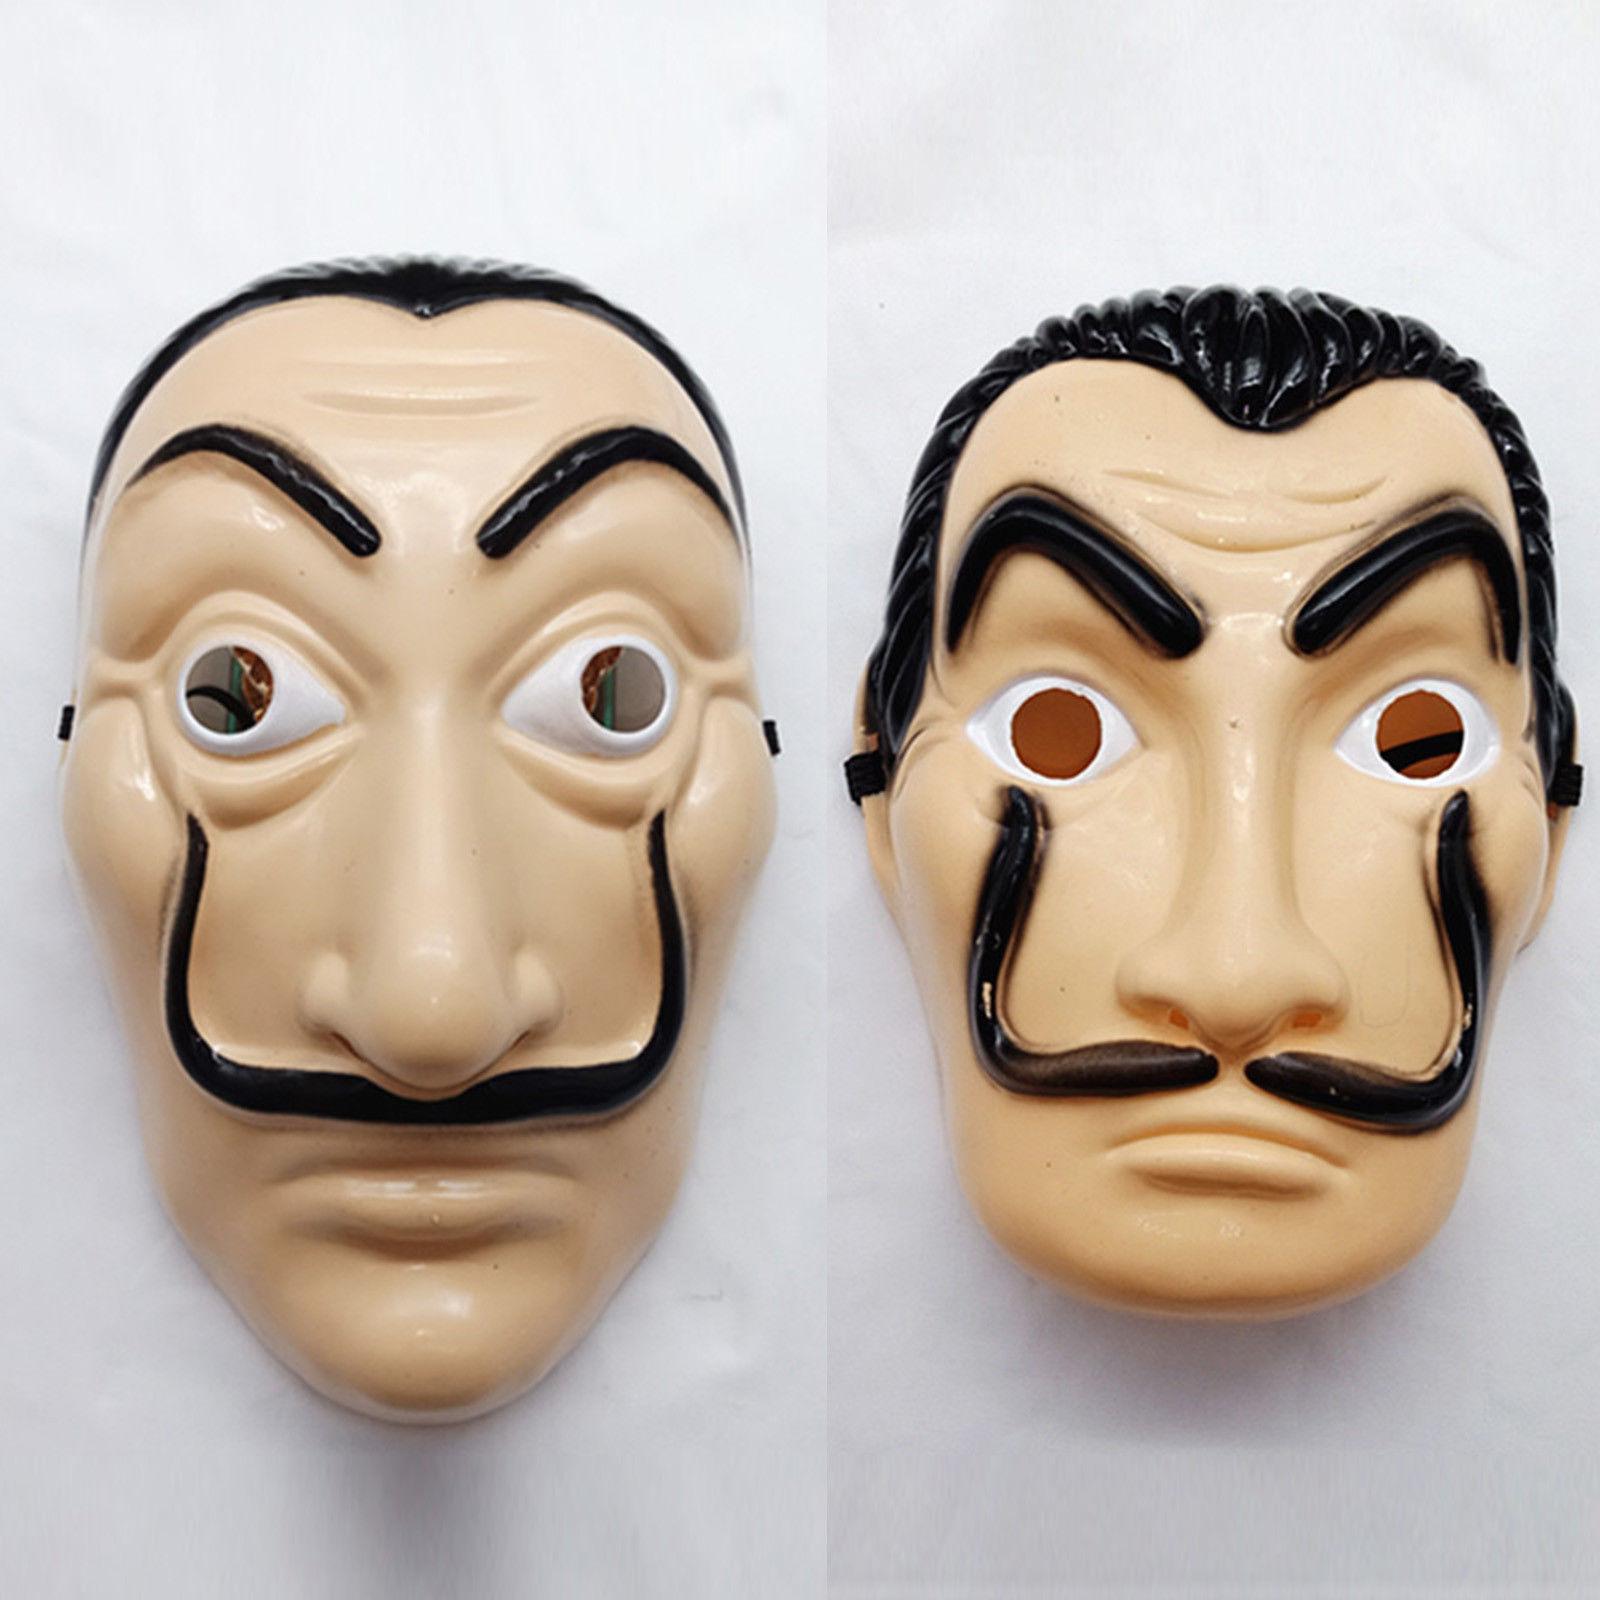 Salvador Dali Money Heist The House of Papel безумная Маскарадная маска для Хэллоуина